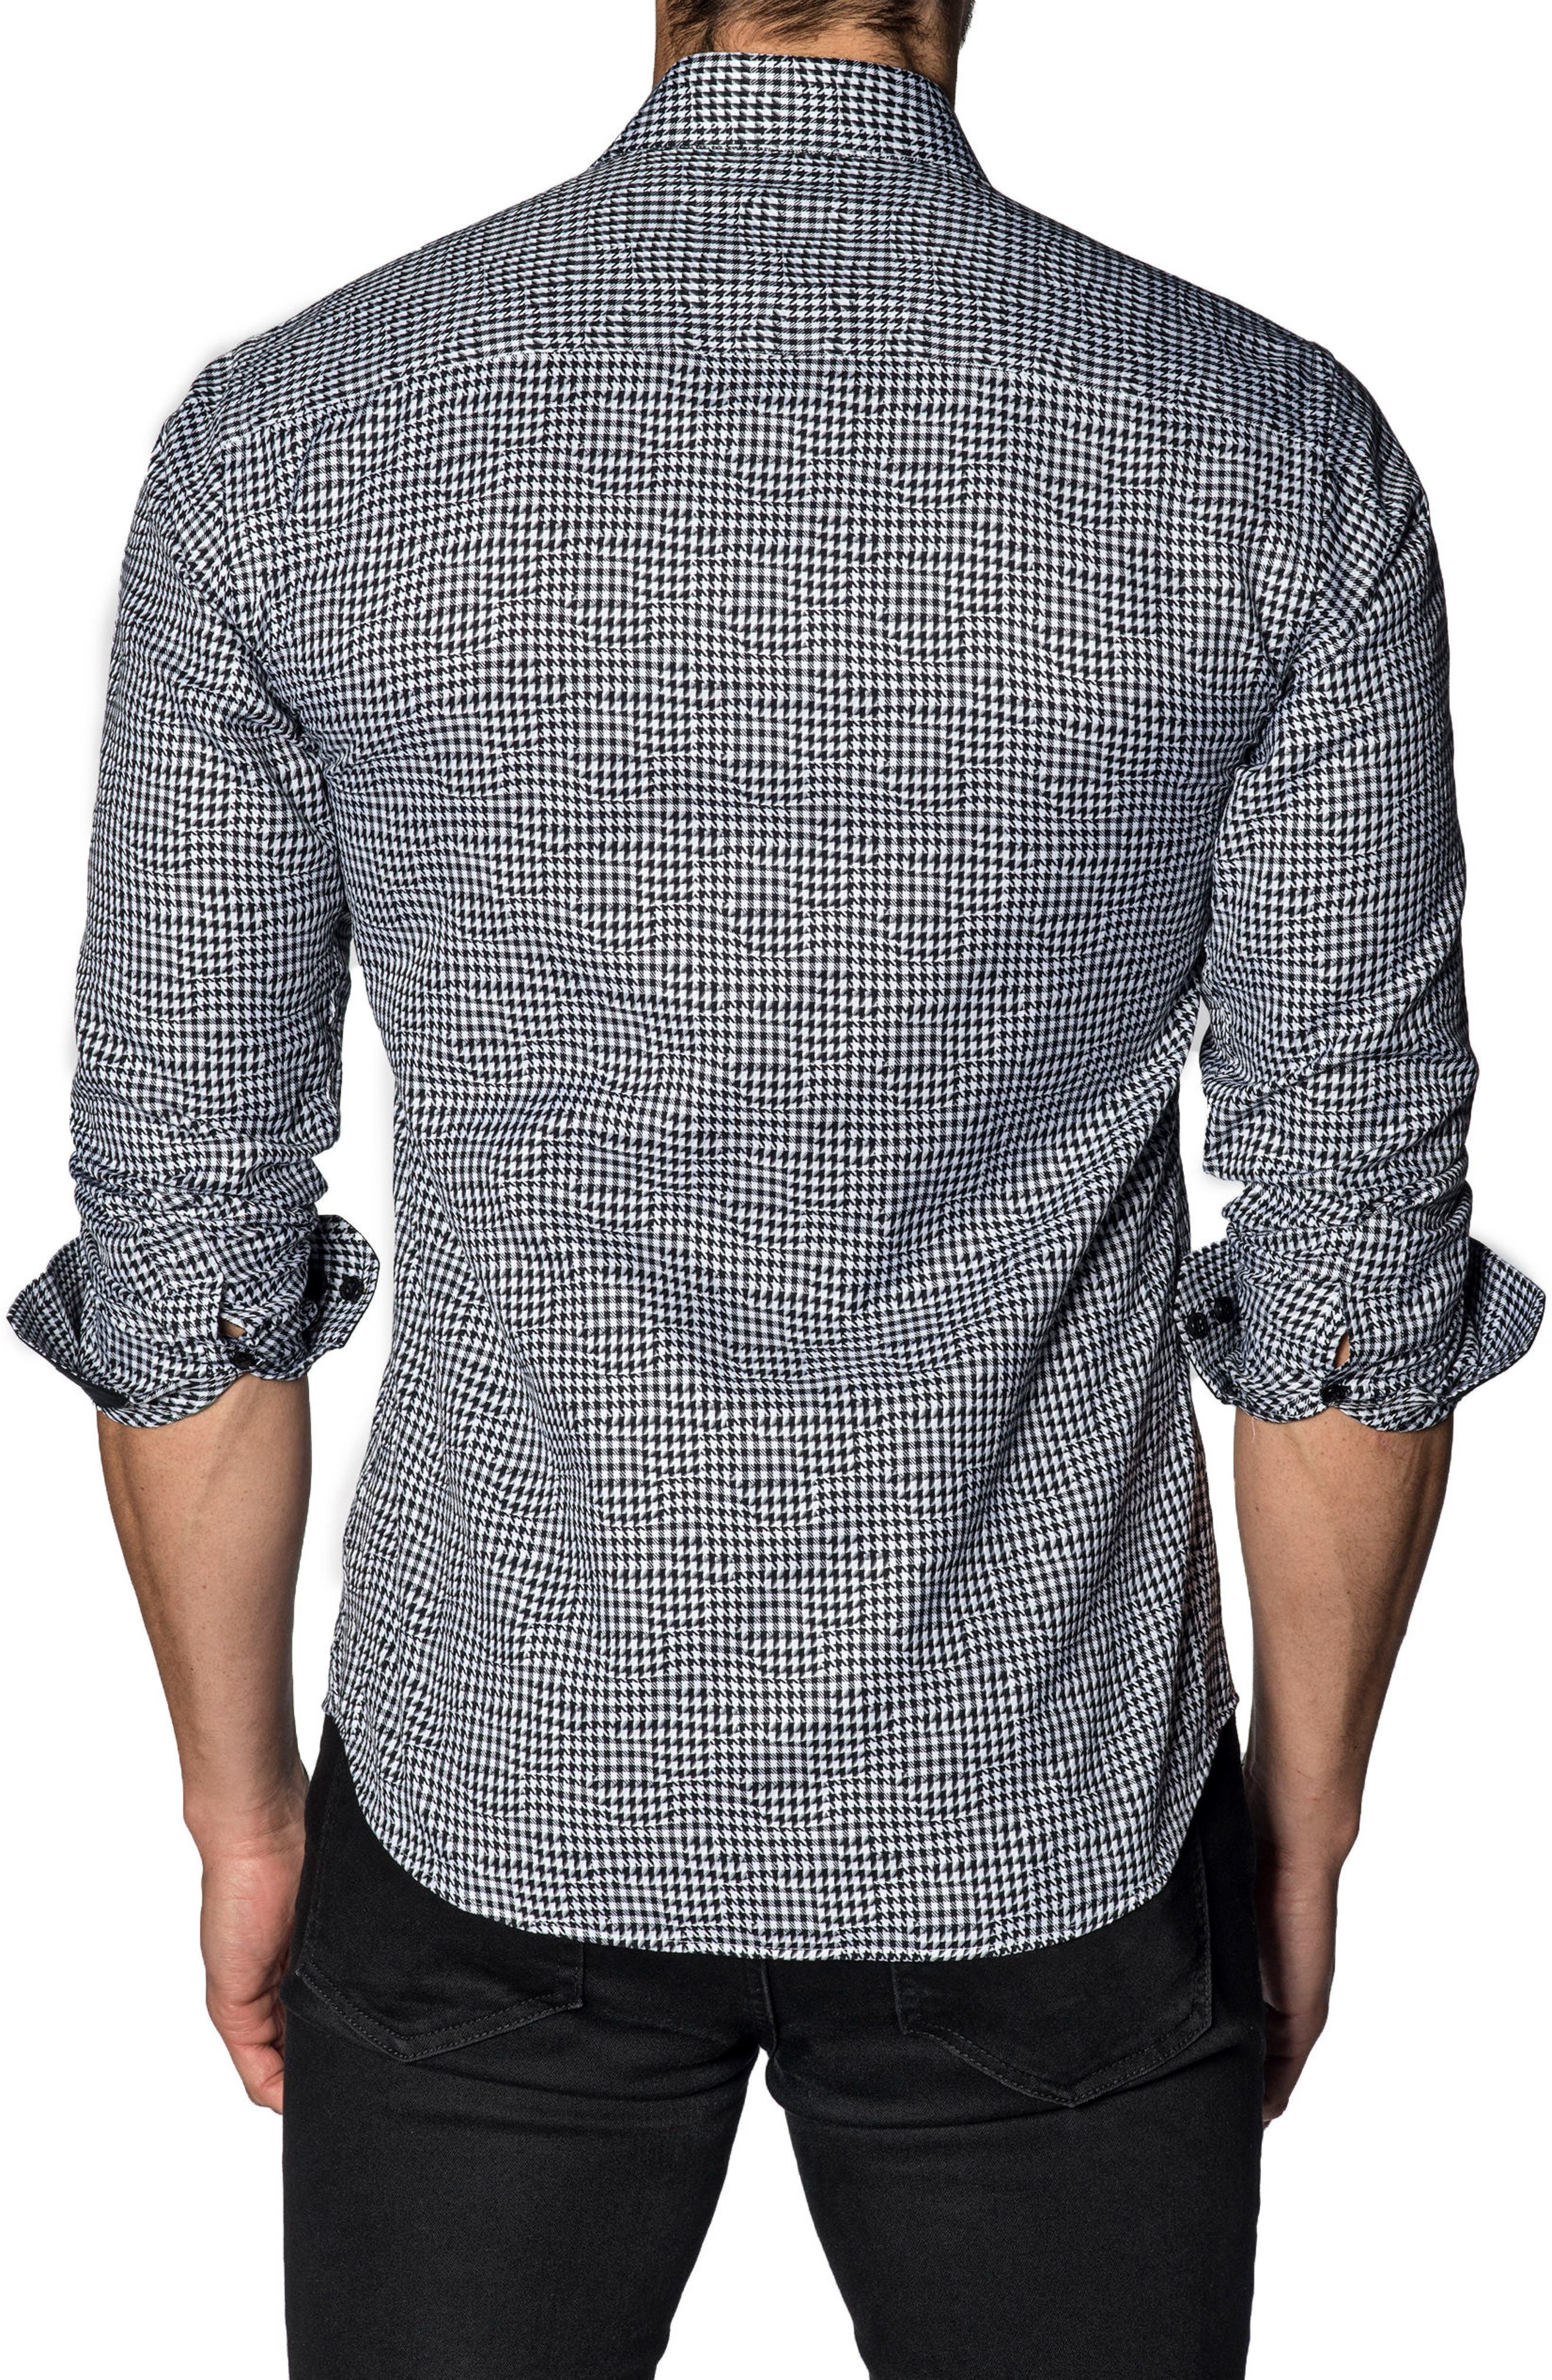 Slim Fit Houndstooth Sport Shirt,                             Alternate thumbnail 2, color,                             WHITE BLACK HOUNDSTOOTH